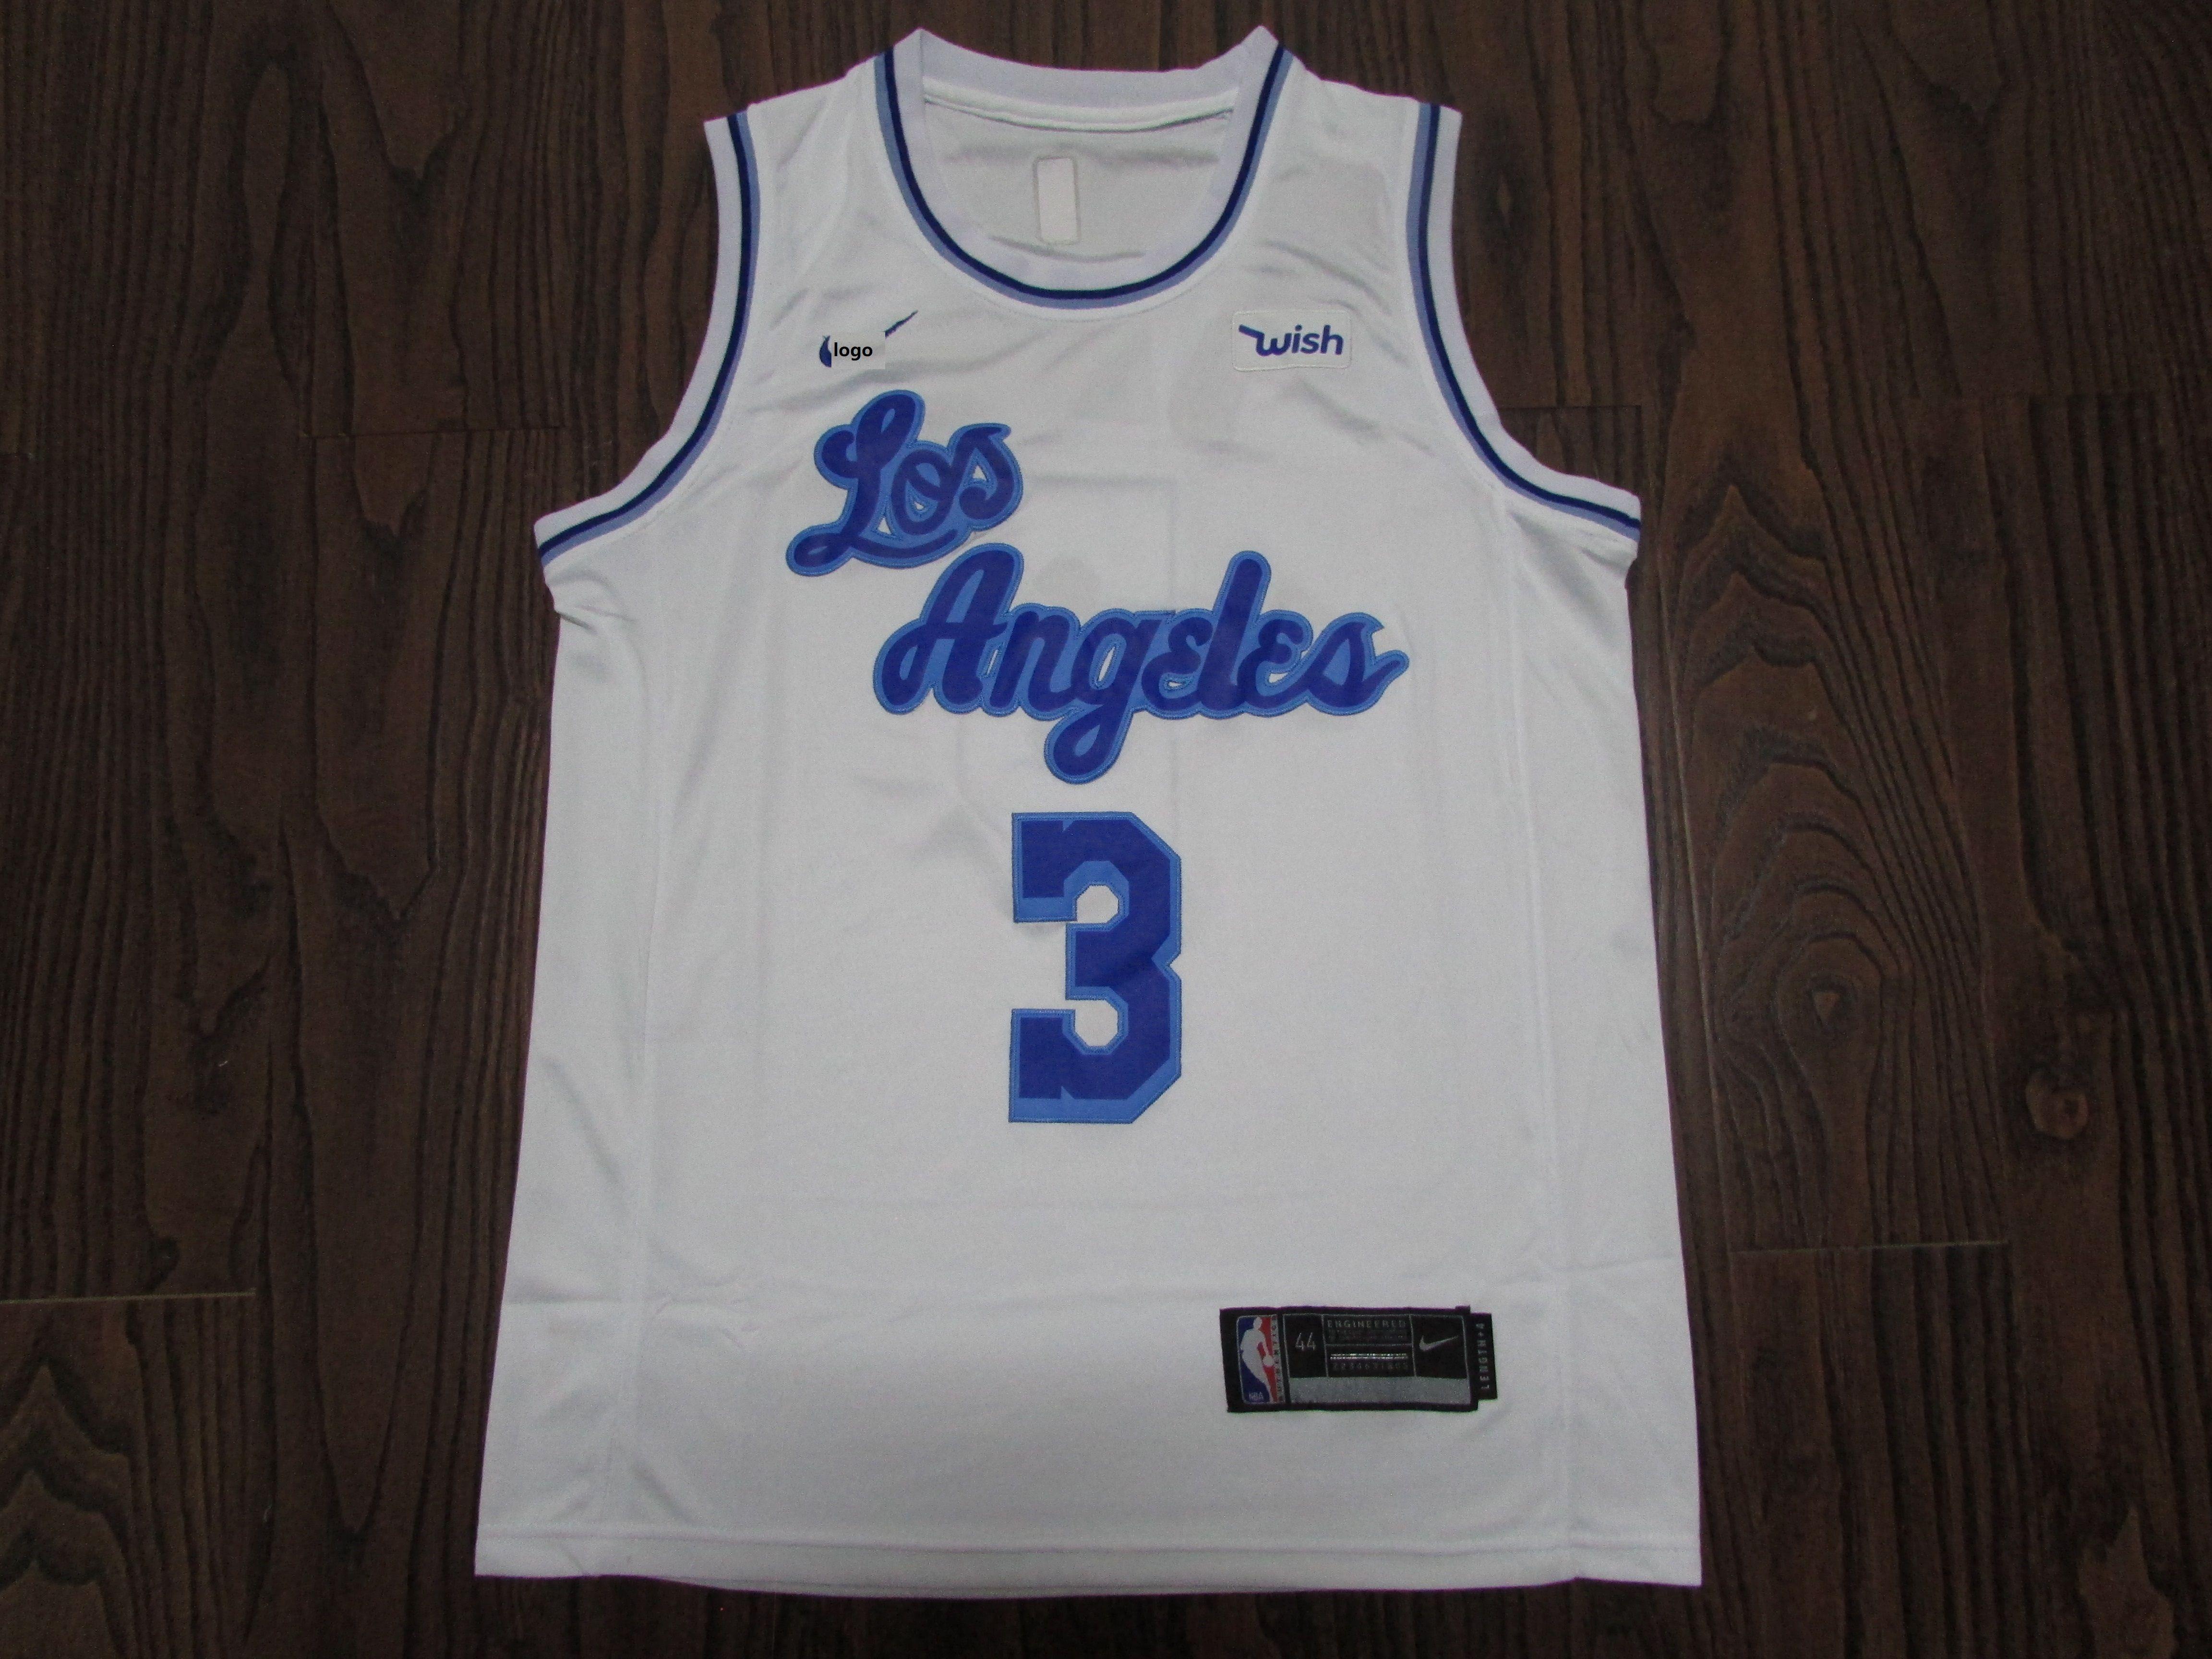 19-20 MEN Lakers basketball jersey shirt retro DAVIS 3 white ...